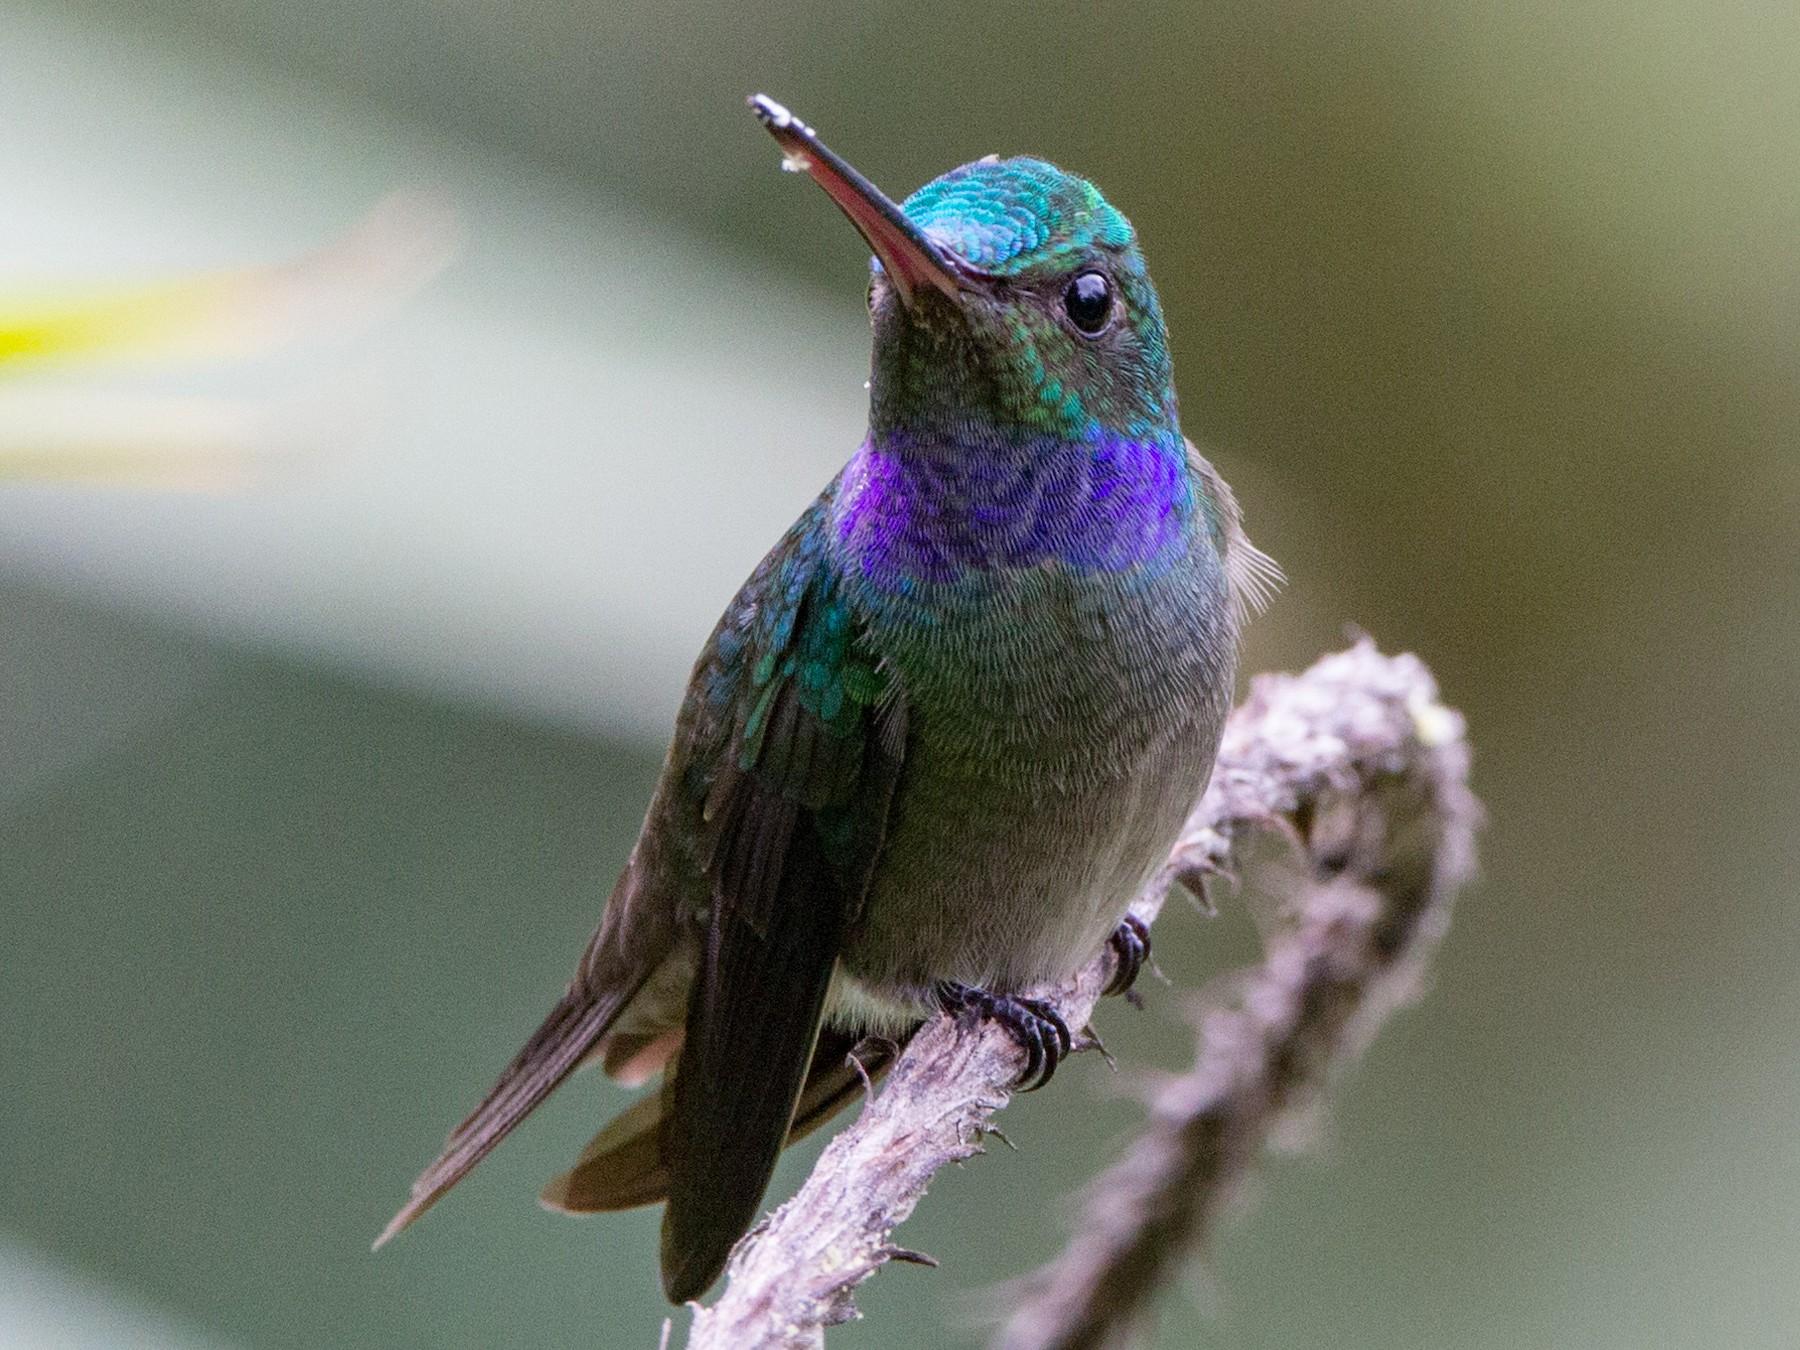 Charming Hummingbird - Pepe Castiblanco